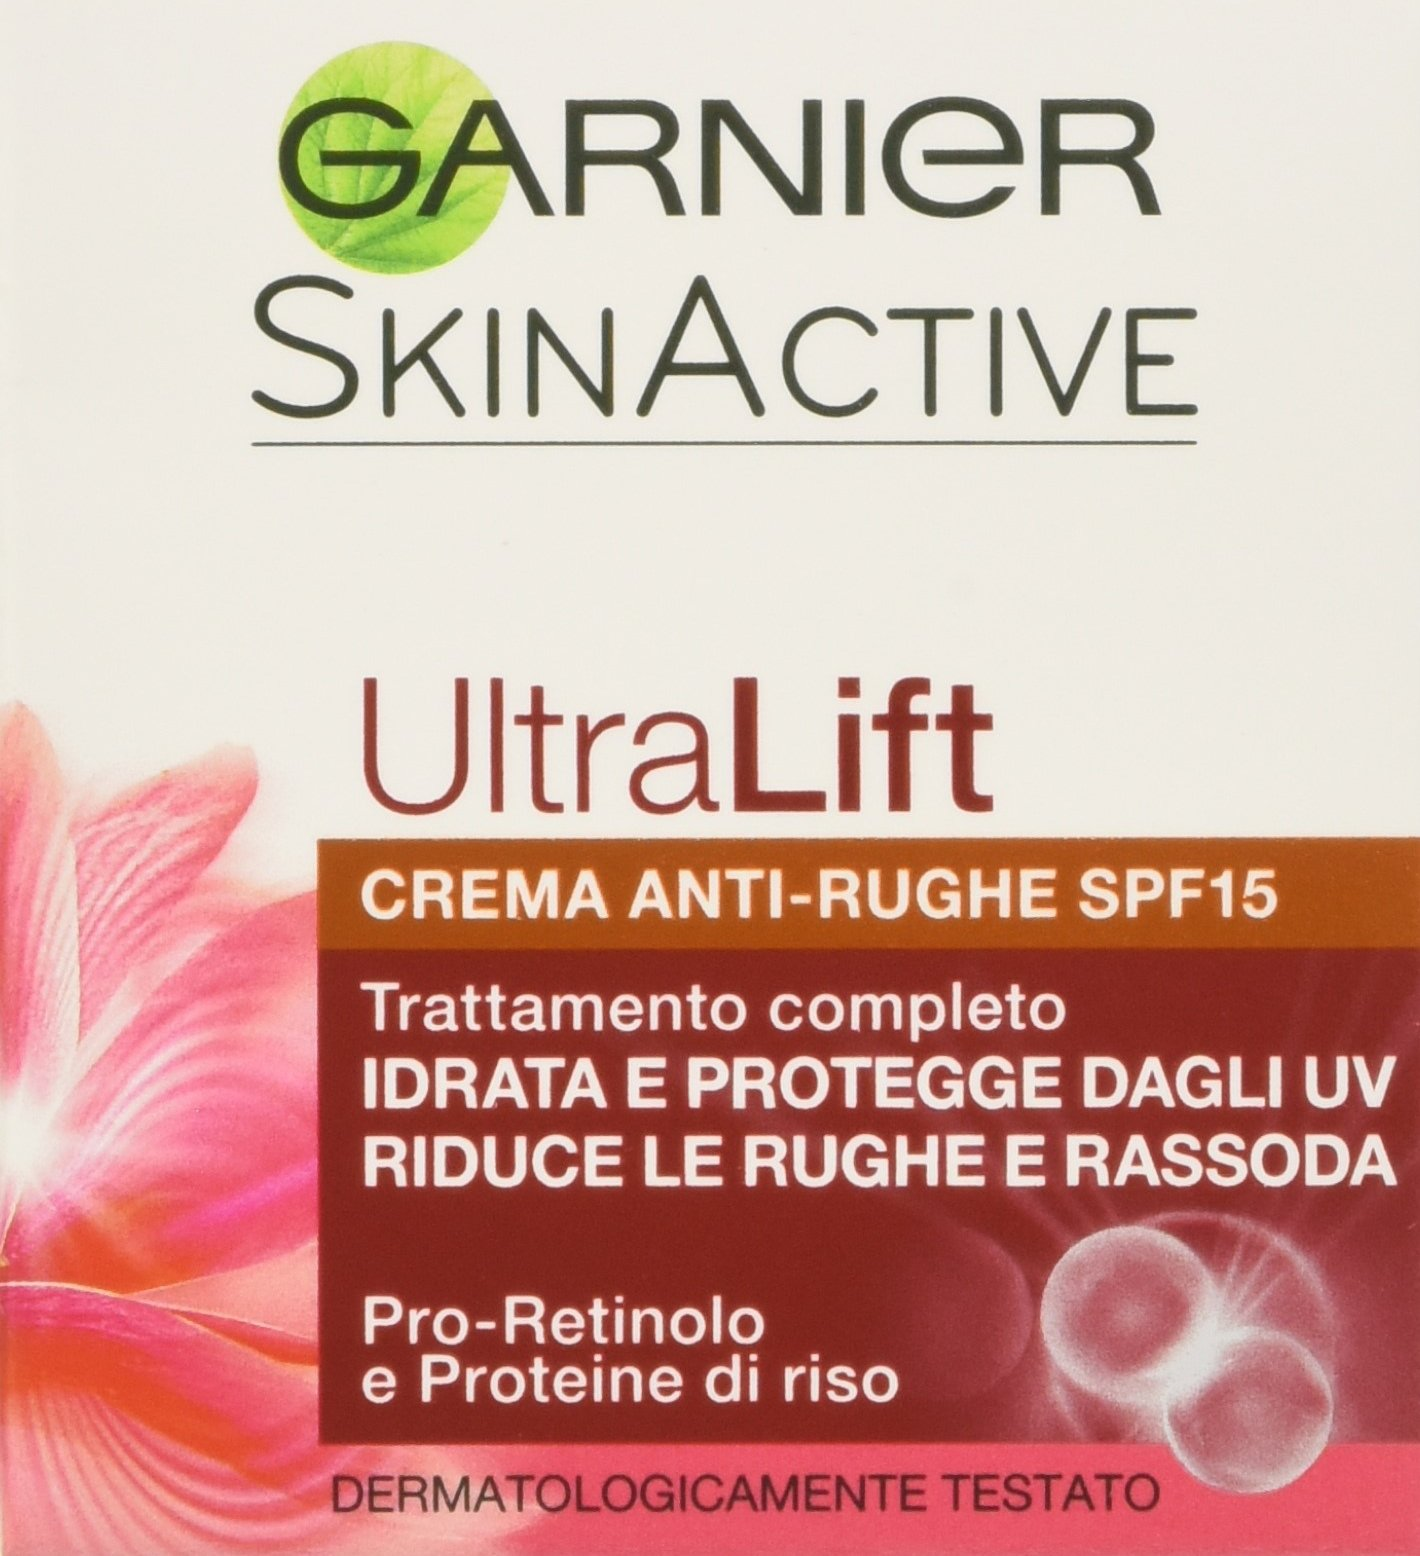 Garnier U/Lift Giorno Spf15